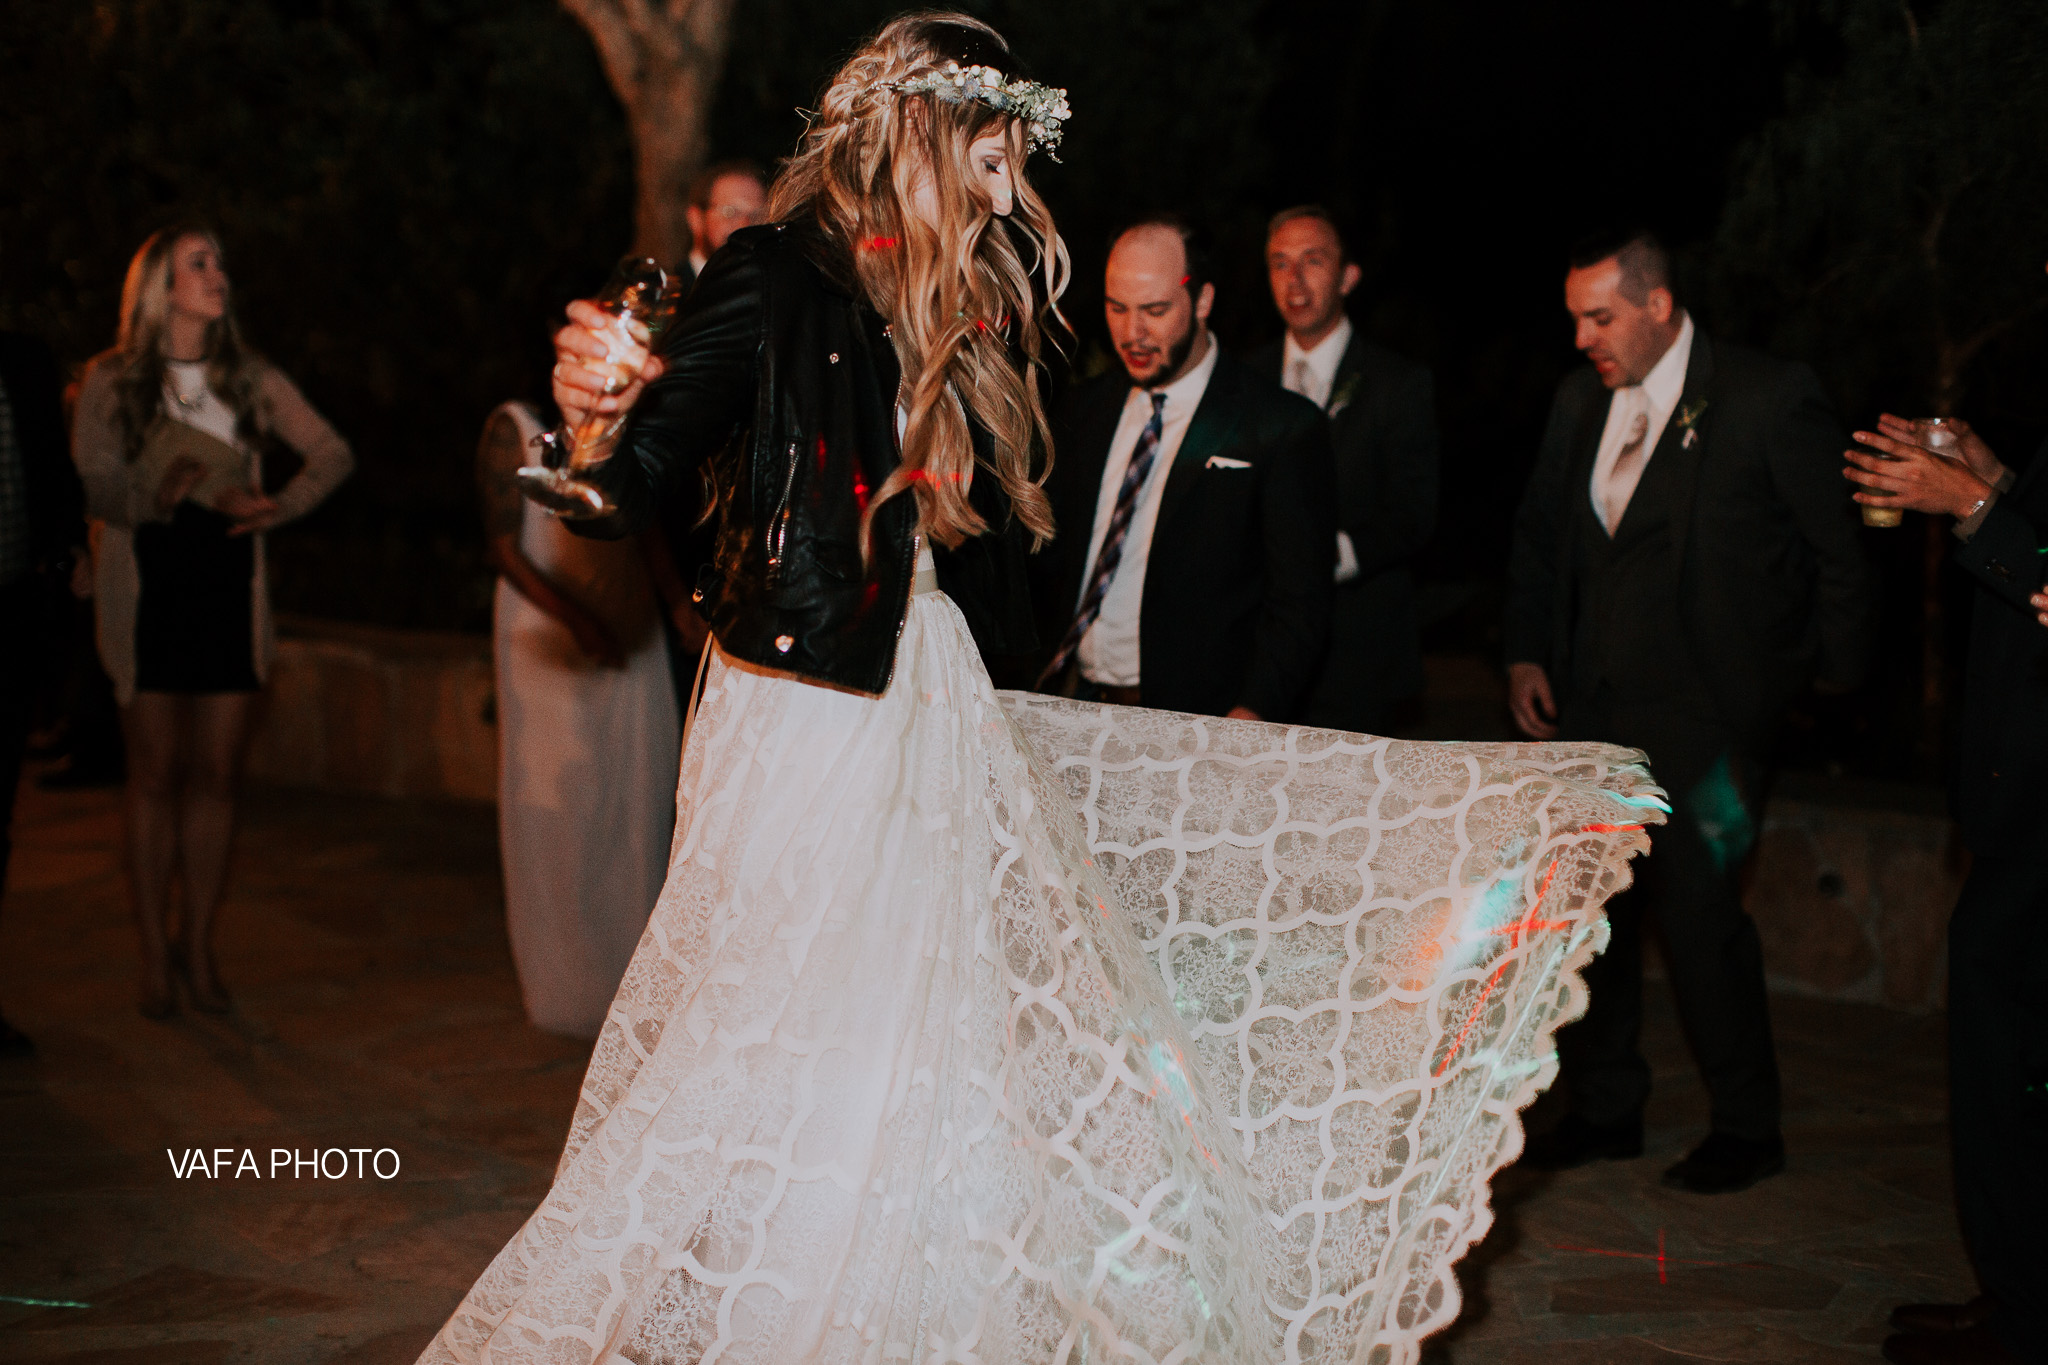 Leo-Carrillo-Ranch-Wedding-Lauren-Mike-Vafa-Photo-1213.jpg